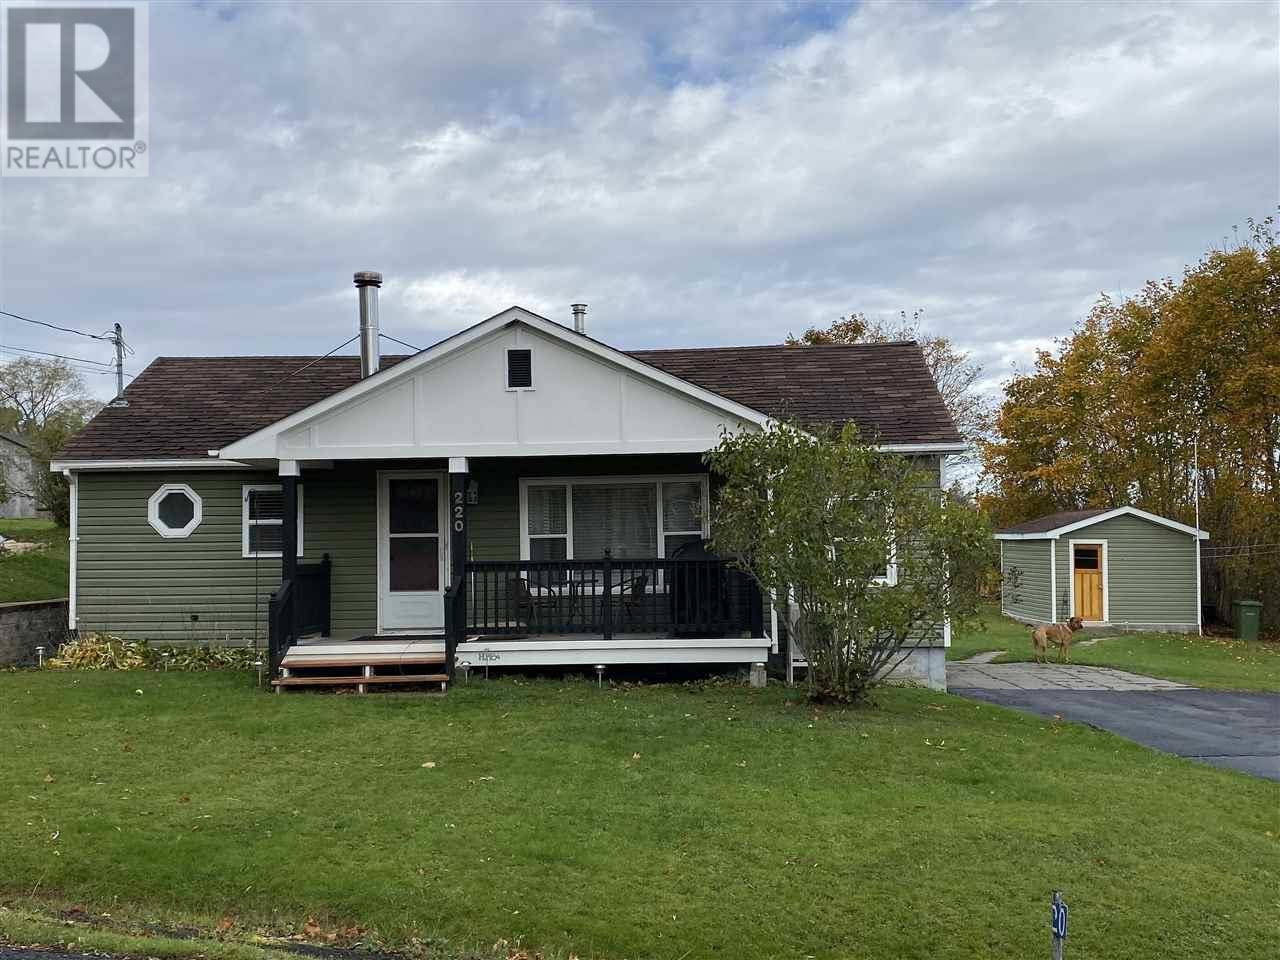 House for sale at 220 Avon St Hants Border Nova Scotia - MLS: 201924983